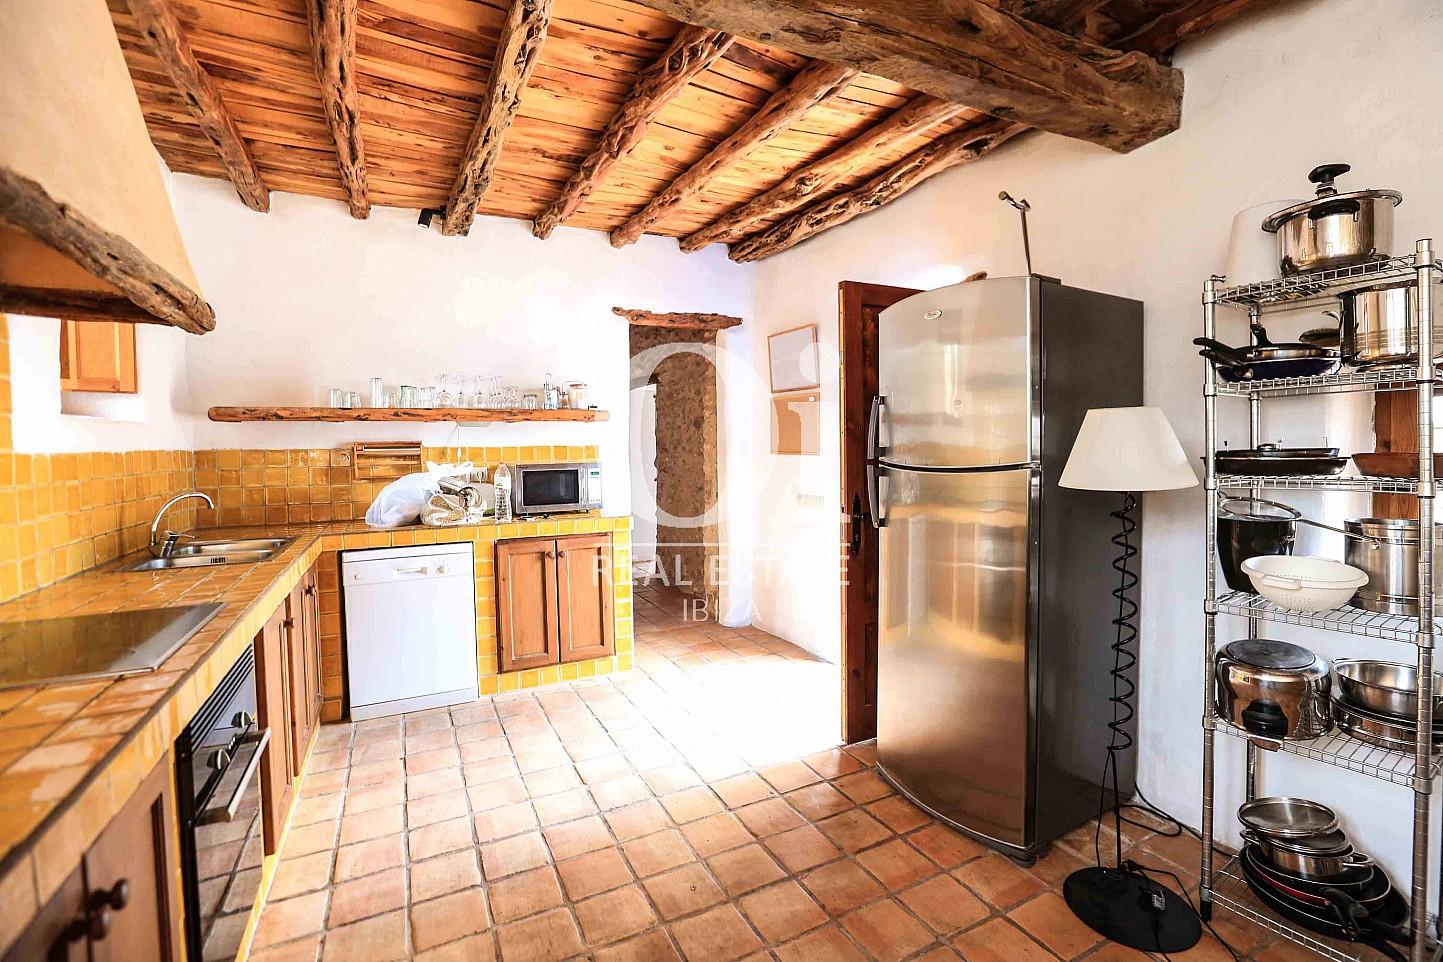 Cocina de casa en alquiler vacacional en zona Puig d'en Valls, Ibiza